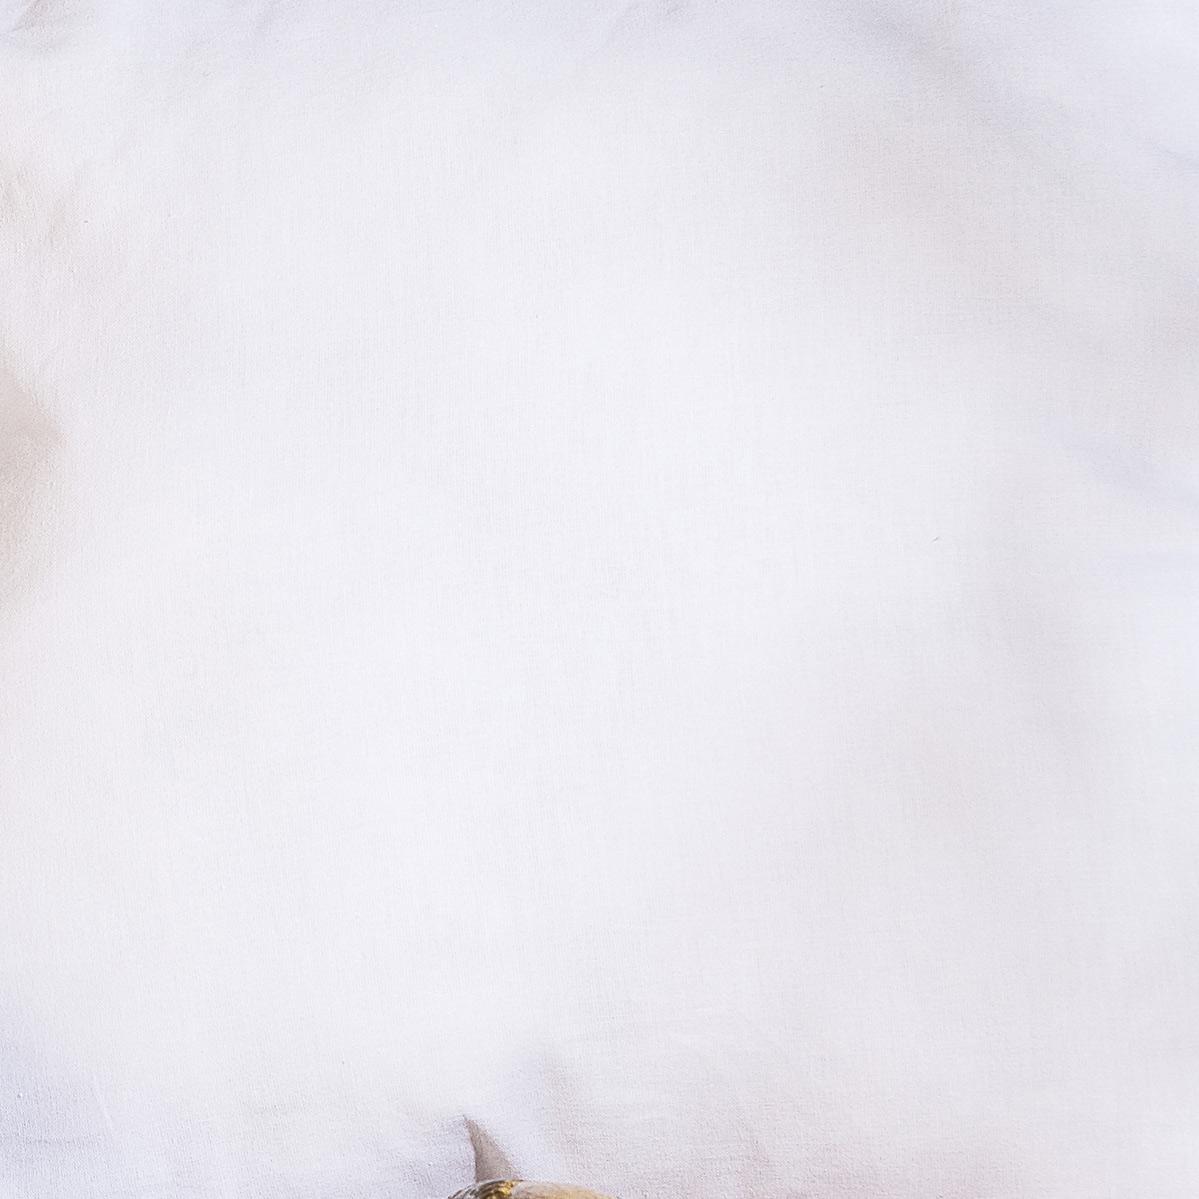 Refil Almofada 50cm x 50cm Branca - Refil Almofada